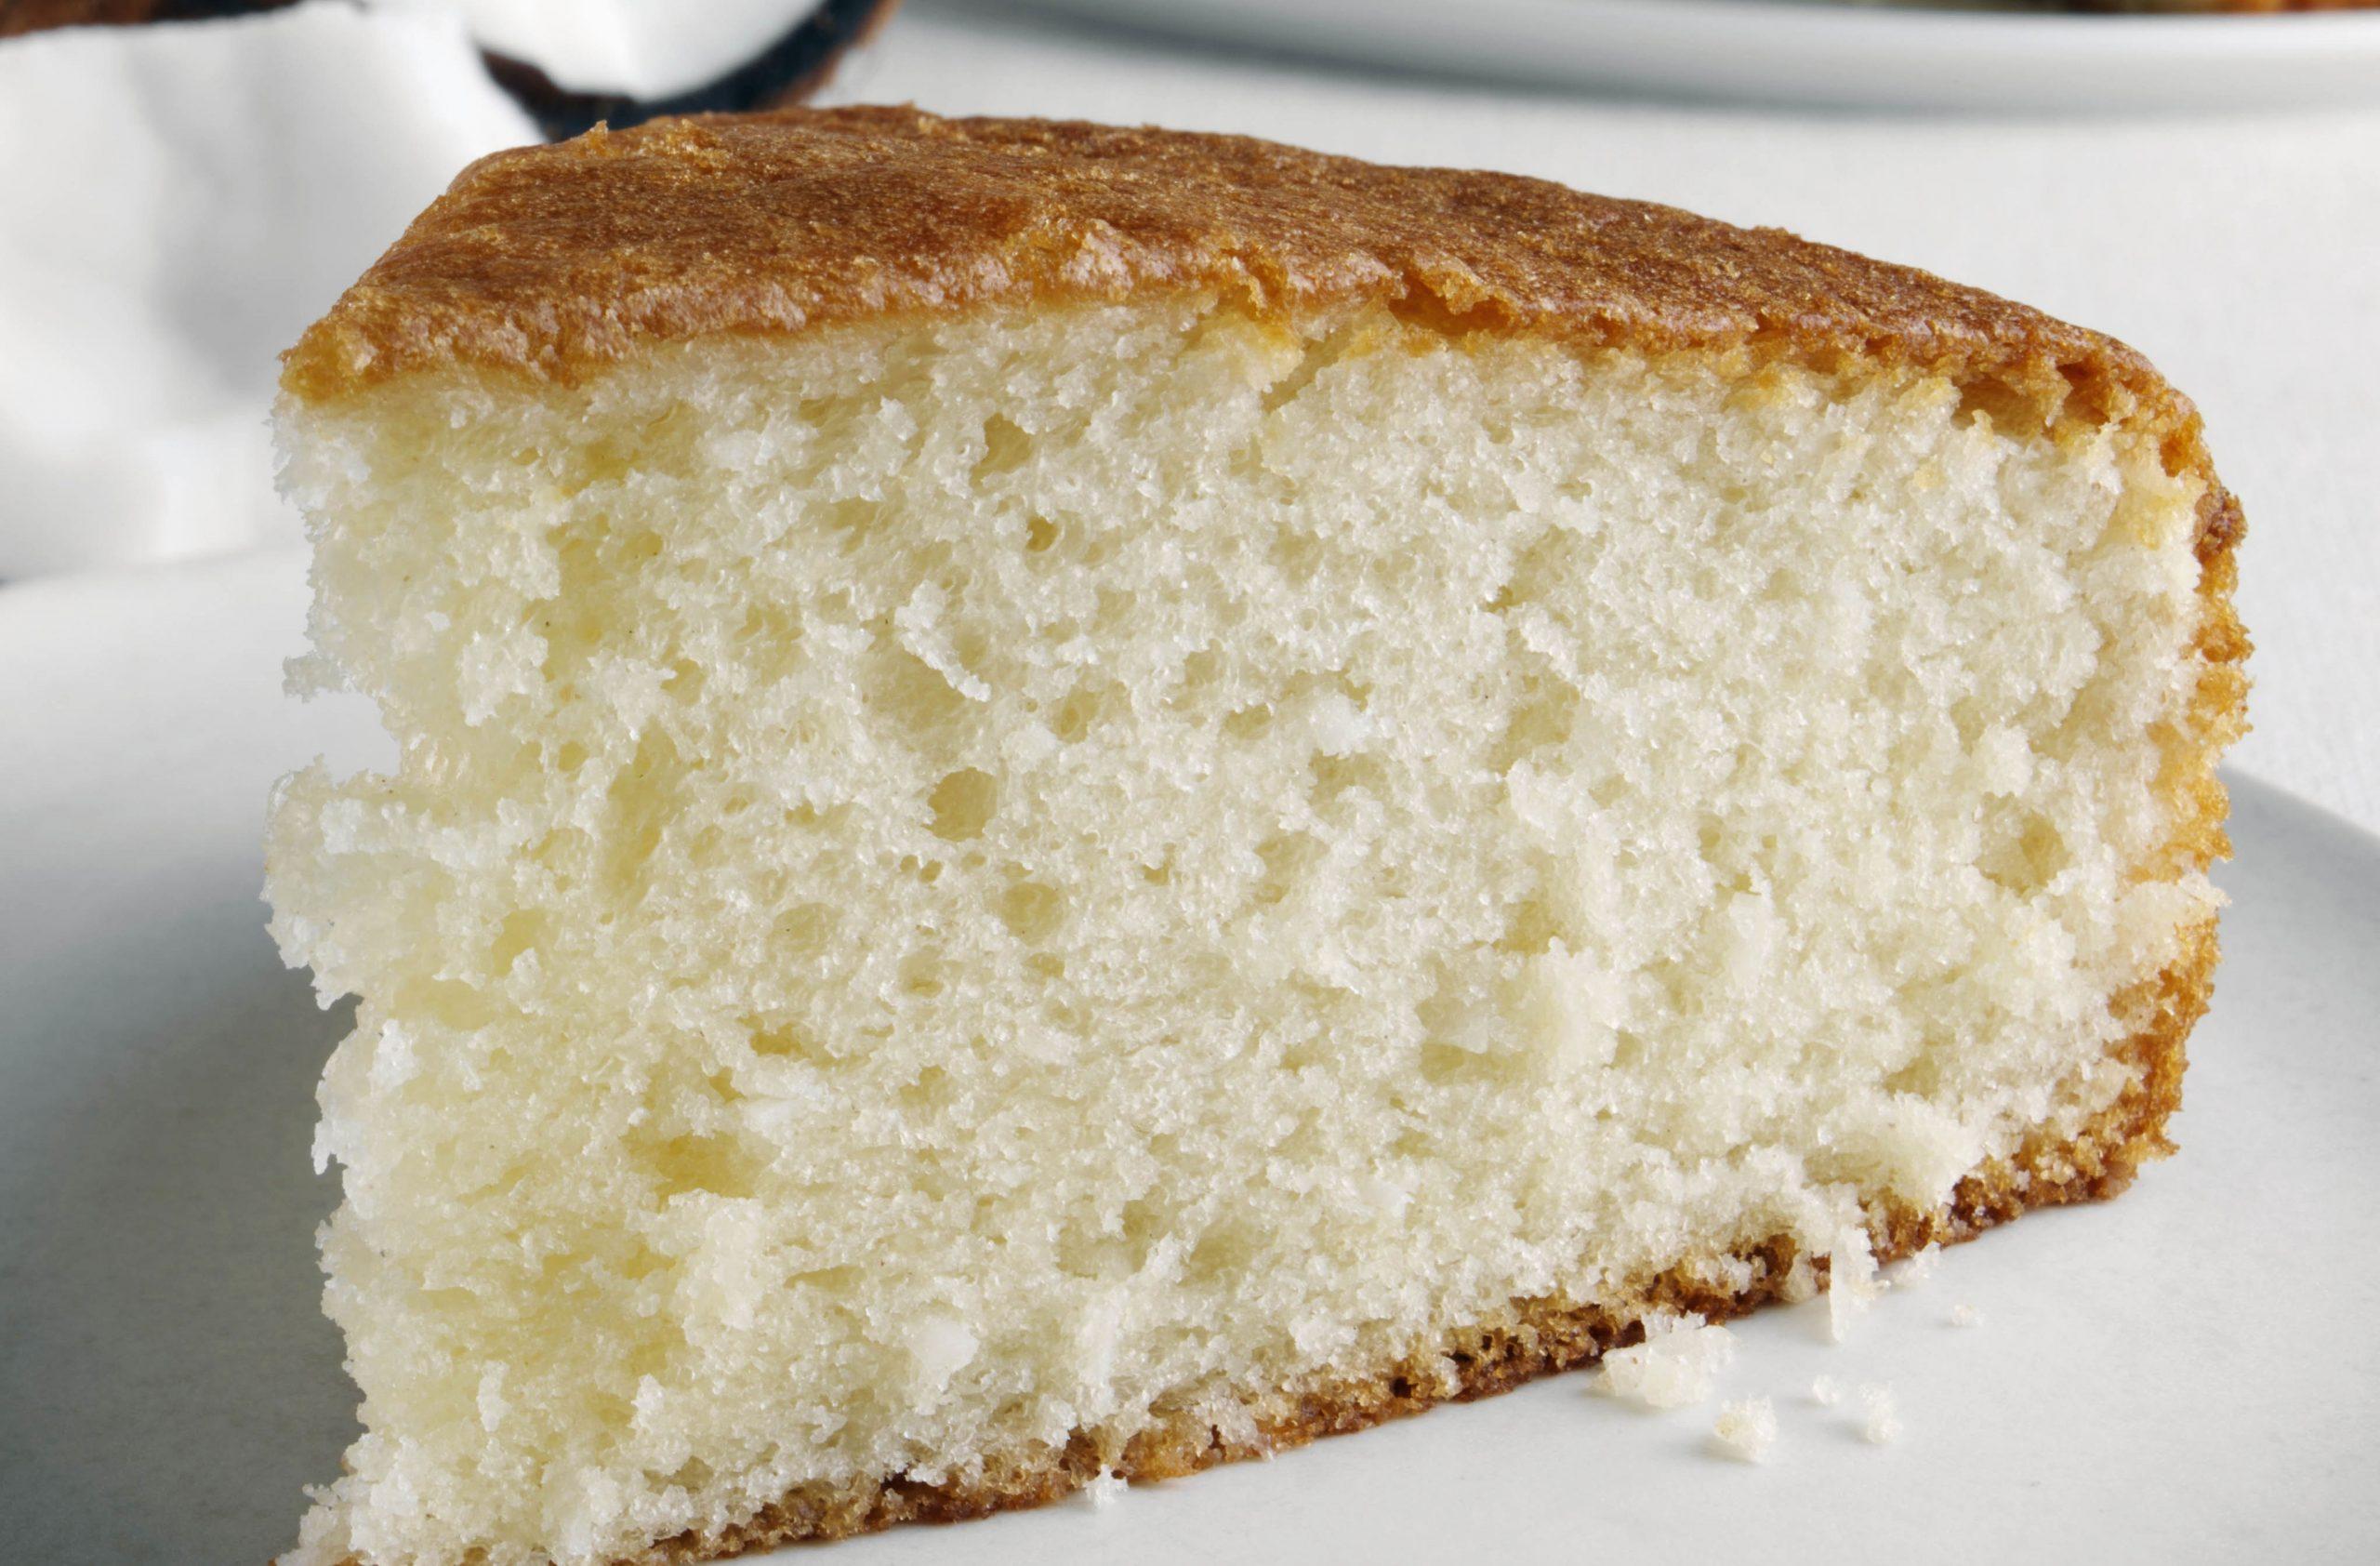 Pleasing Coconut Cake Baking Recipes Goodtoknow Funny Birthday Cards Online Inifodamsfinfo